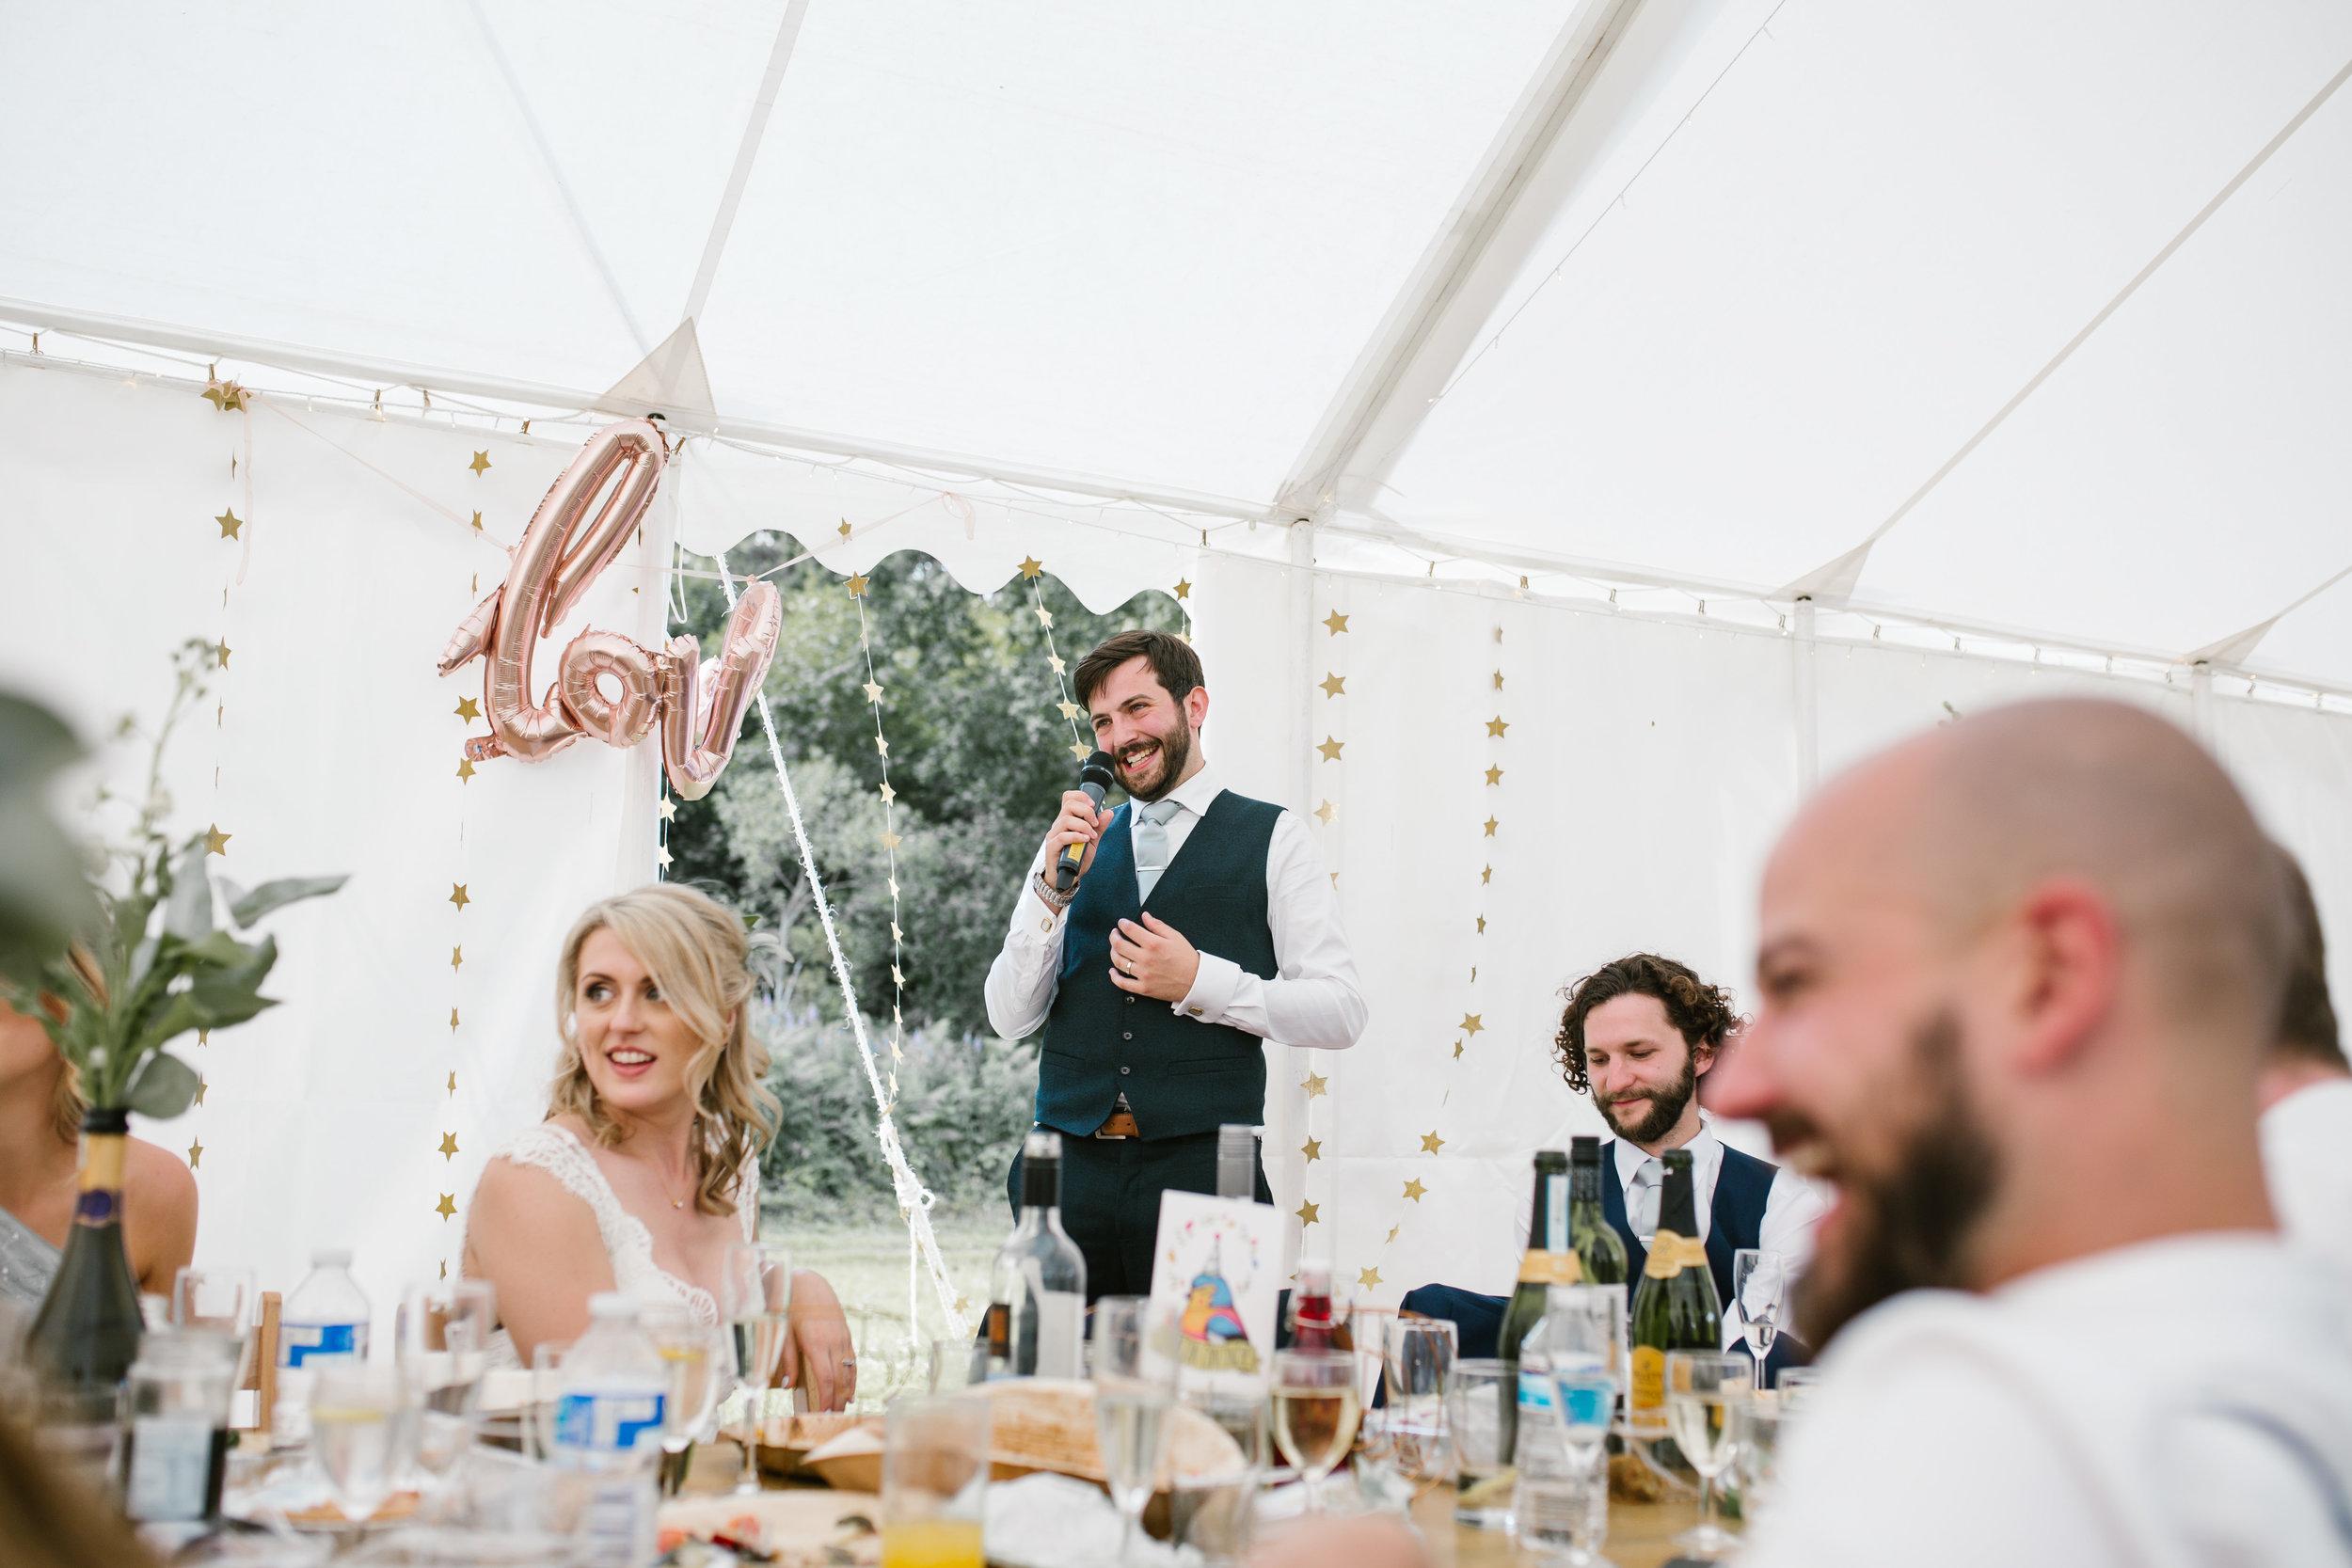 Cotswolds wedding, cotswolds wedding photographer, DIY wedding, forest wedding, marquee wedding, fun wedding, alternative wedding-338.jpg